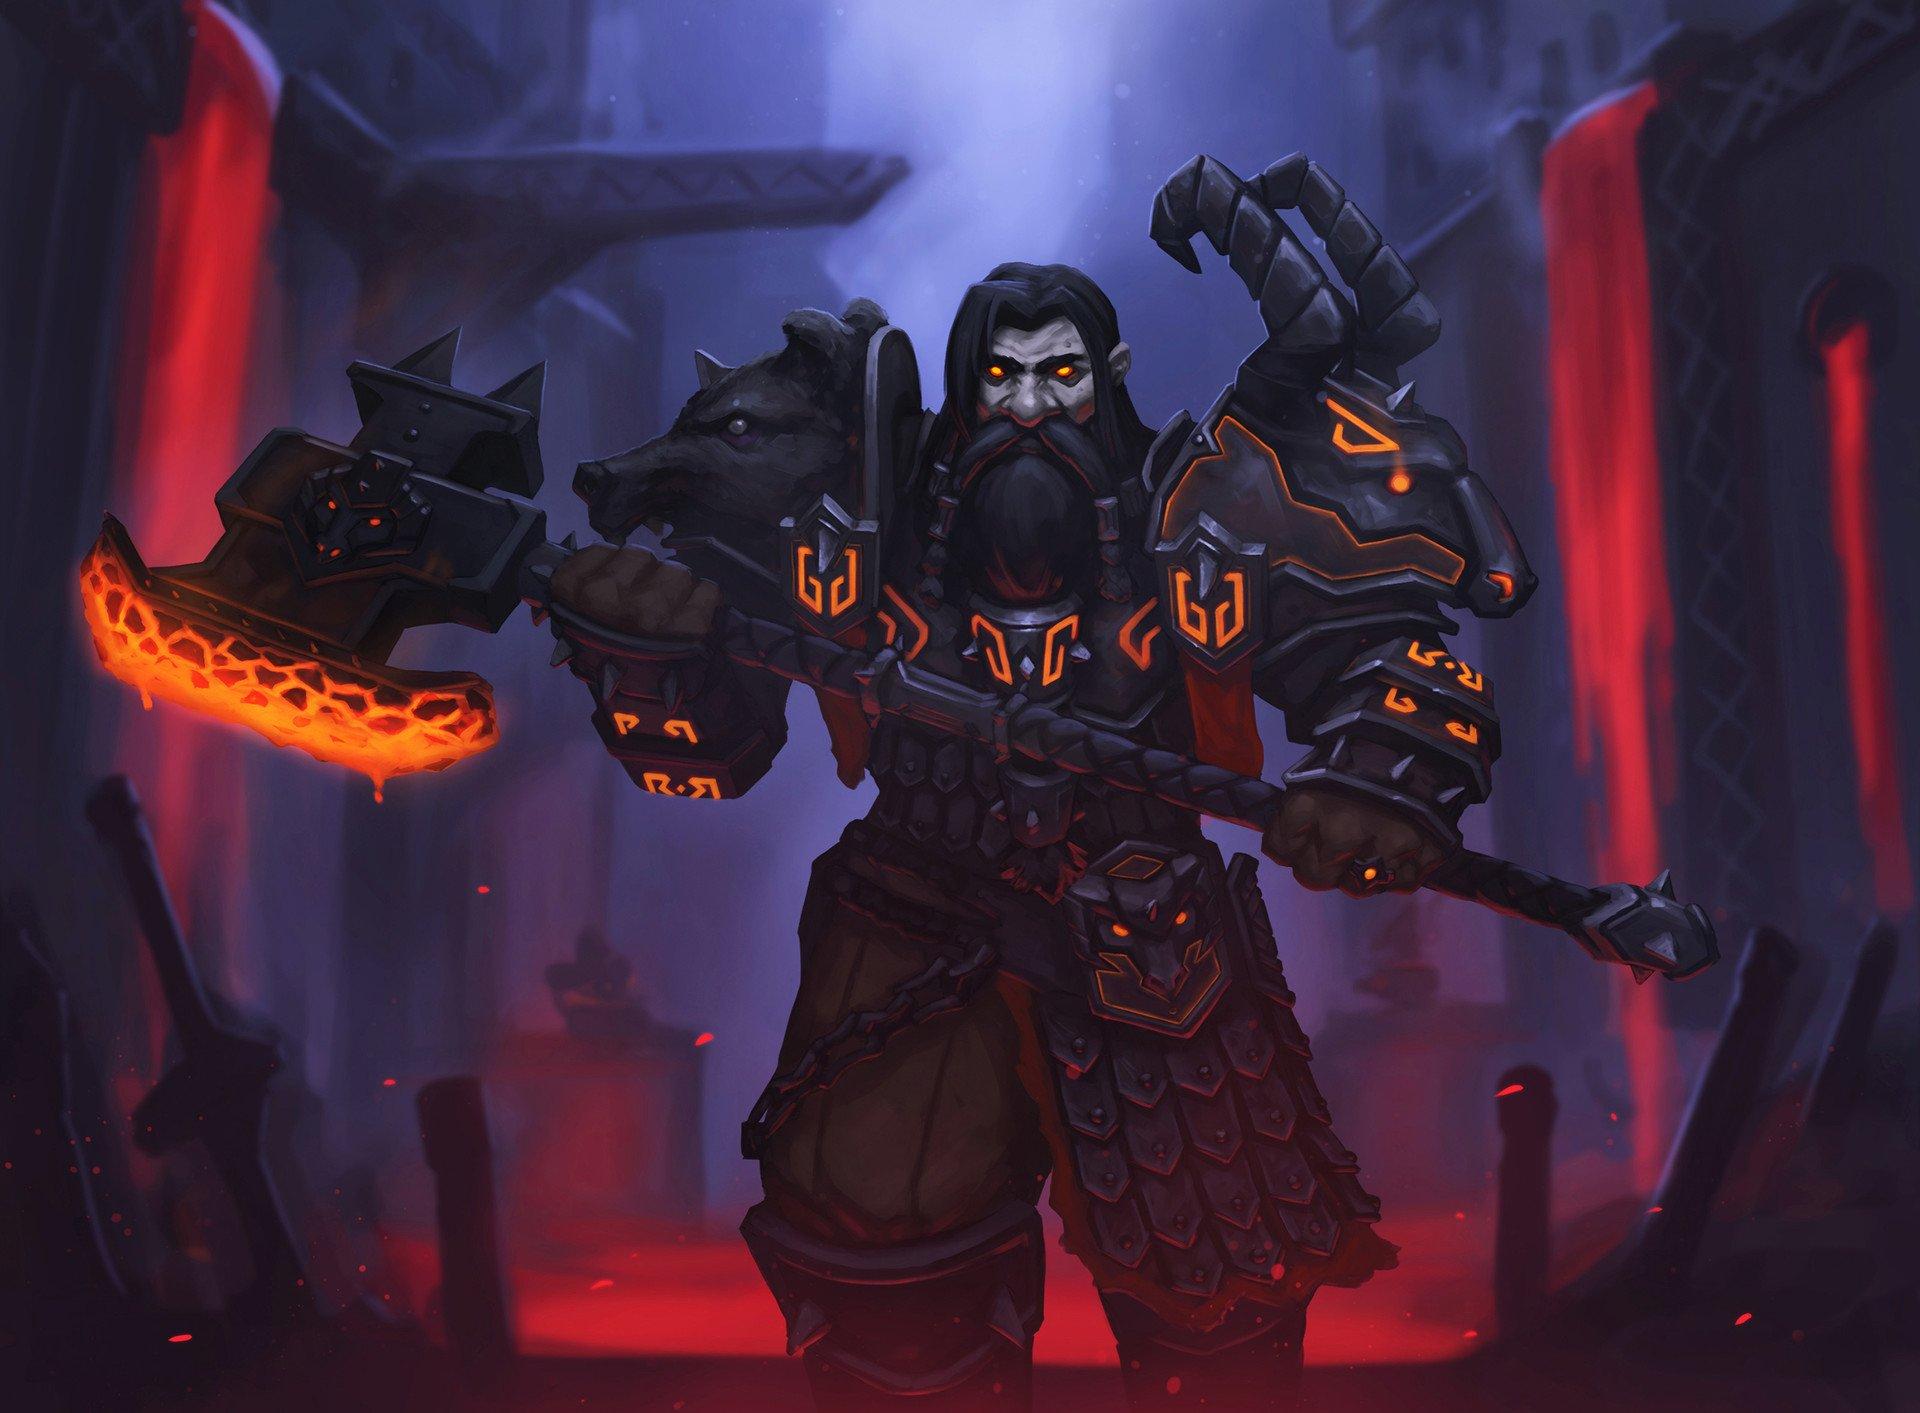 World of Warcraft: Battle for Azeroth Дворф Черного железа - World of Warcraft Арт, Дворф